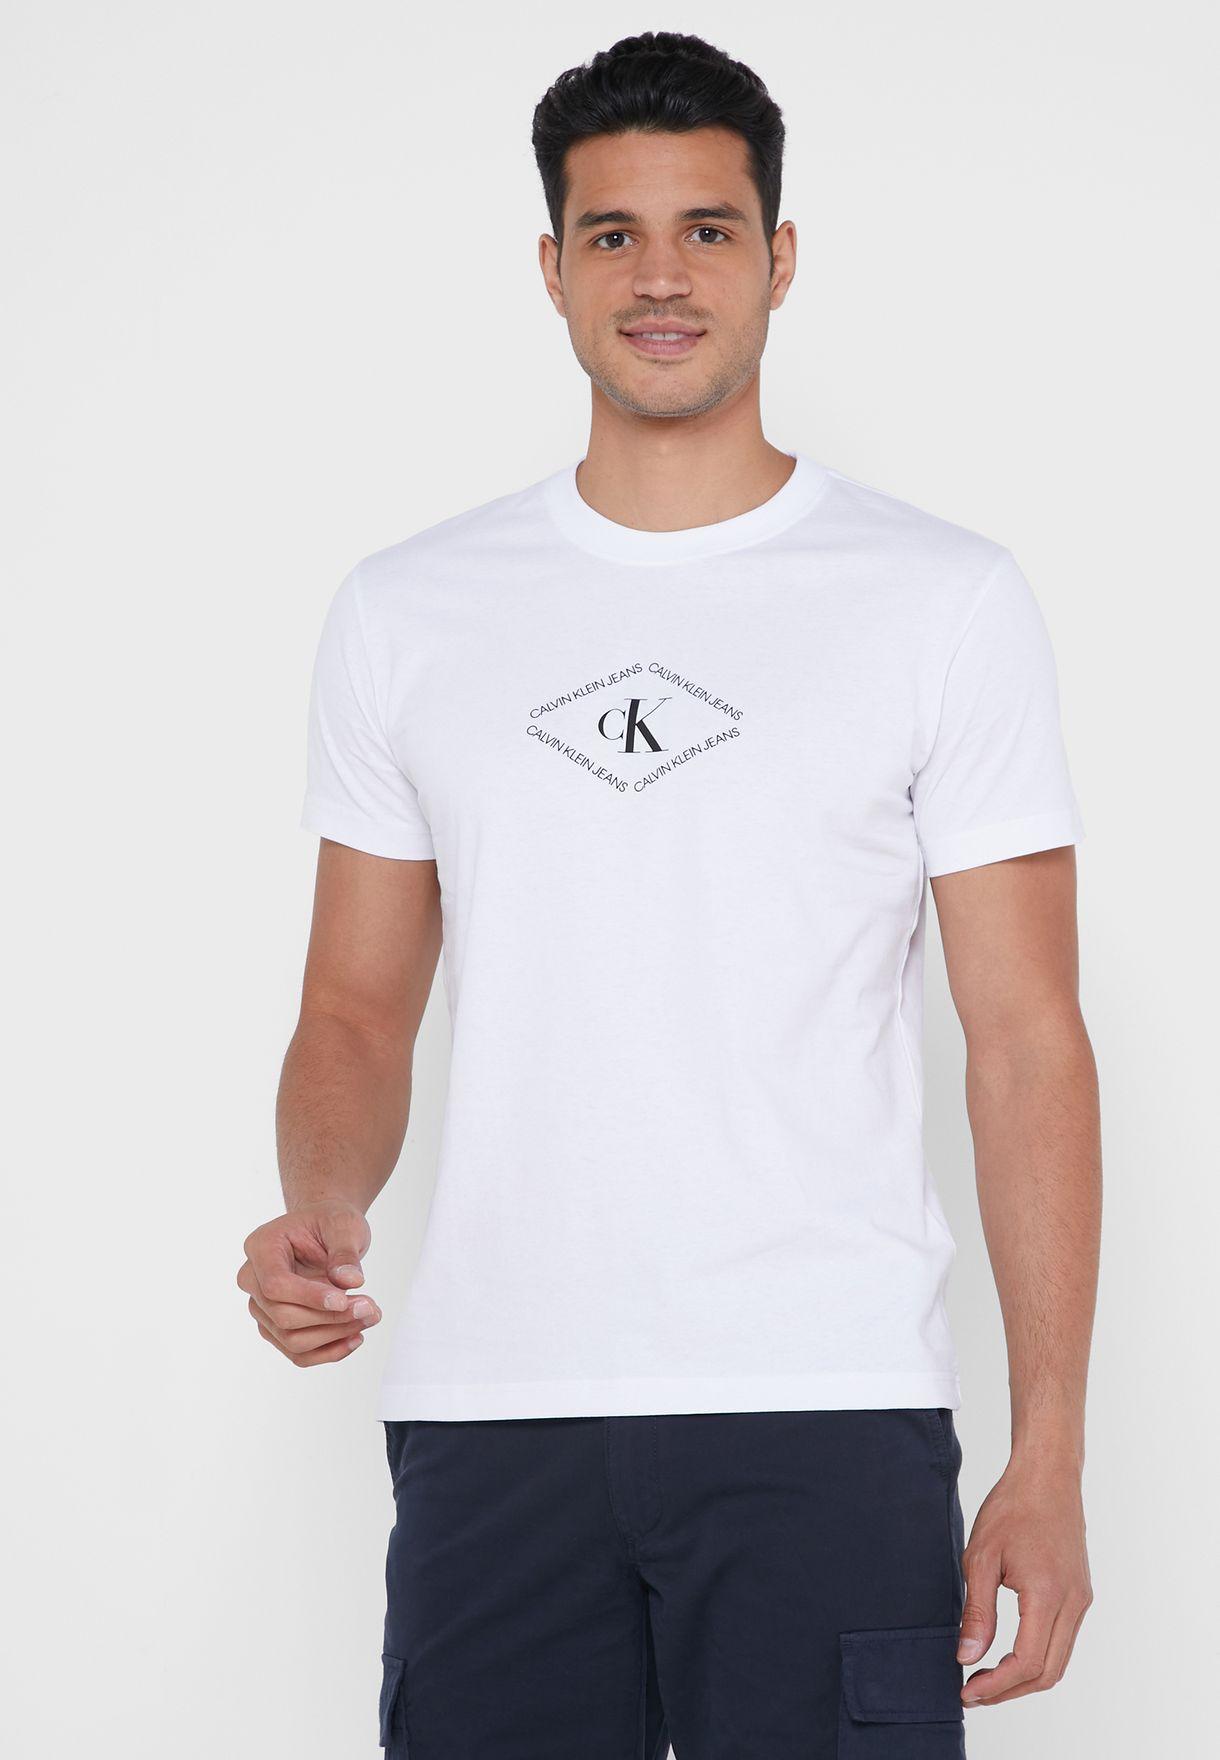 Skate Back Graphic Crew Neck T-Shirt